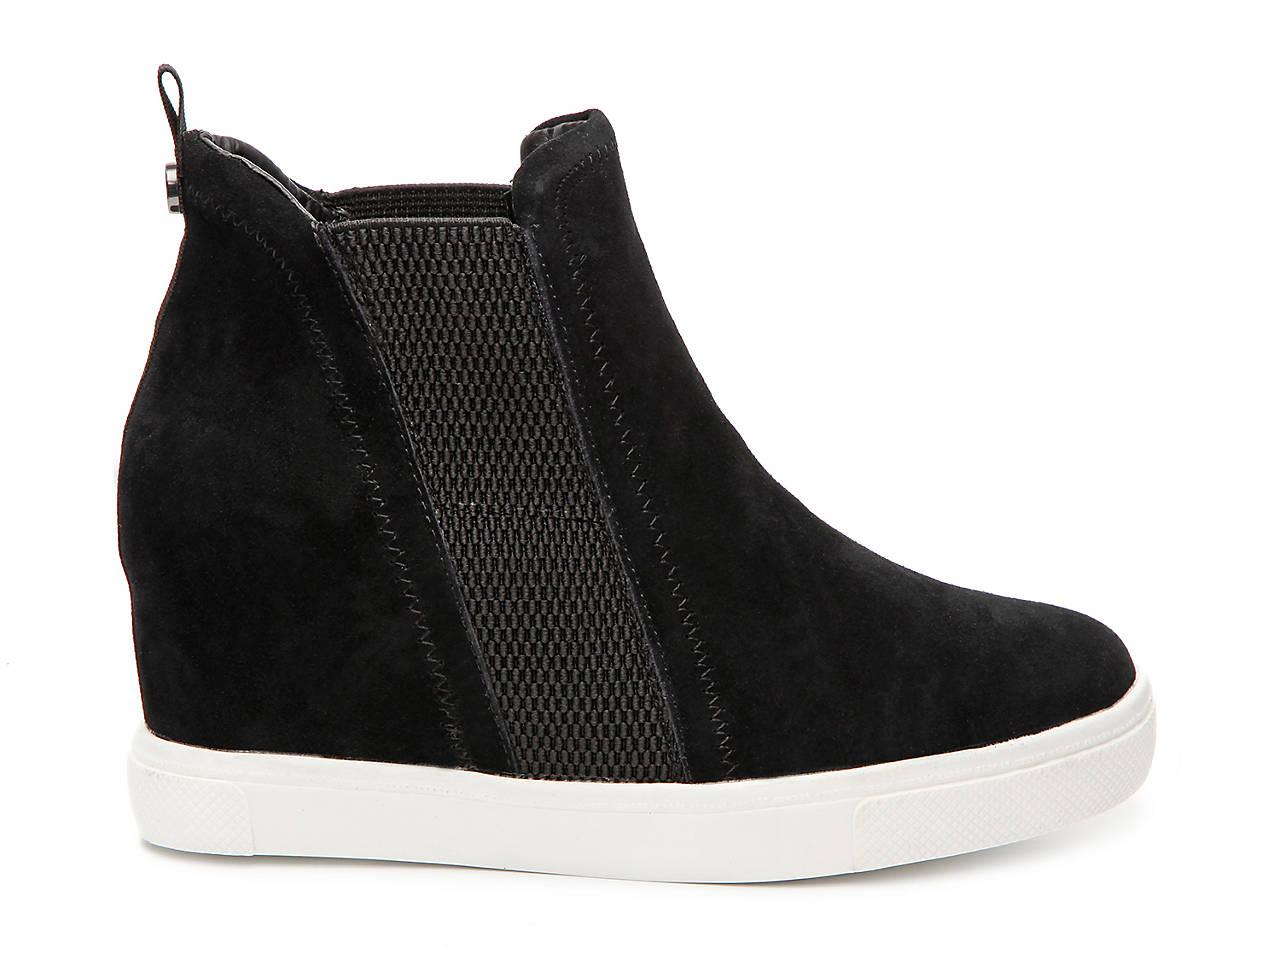 efc8dbf3f37 Steve Madden Leii Wedge Sneaker Women s Shoes